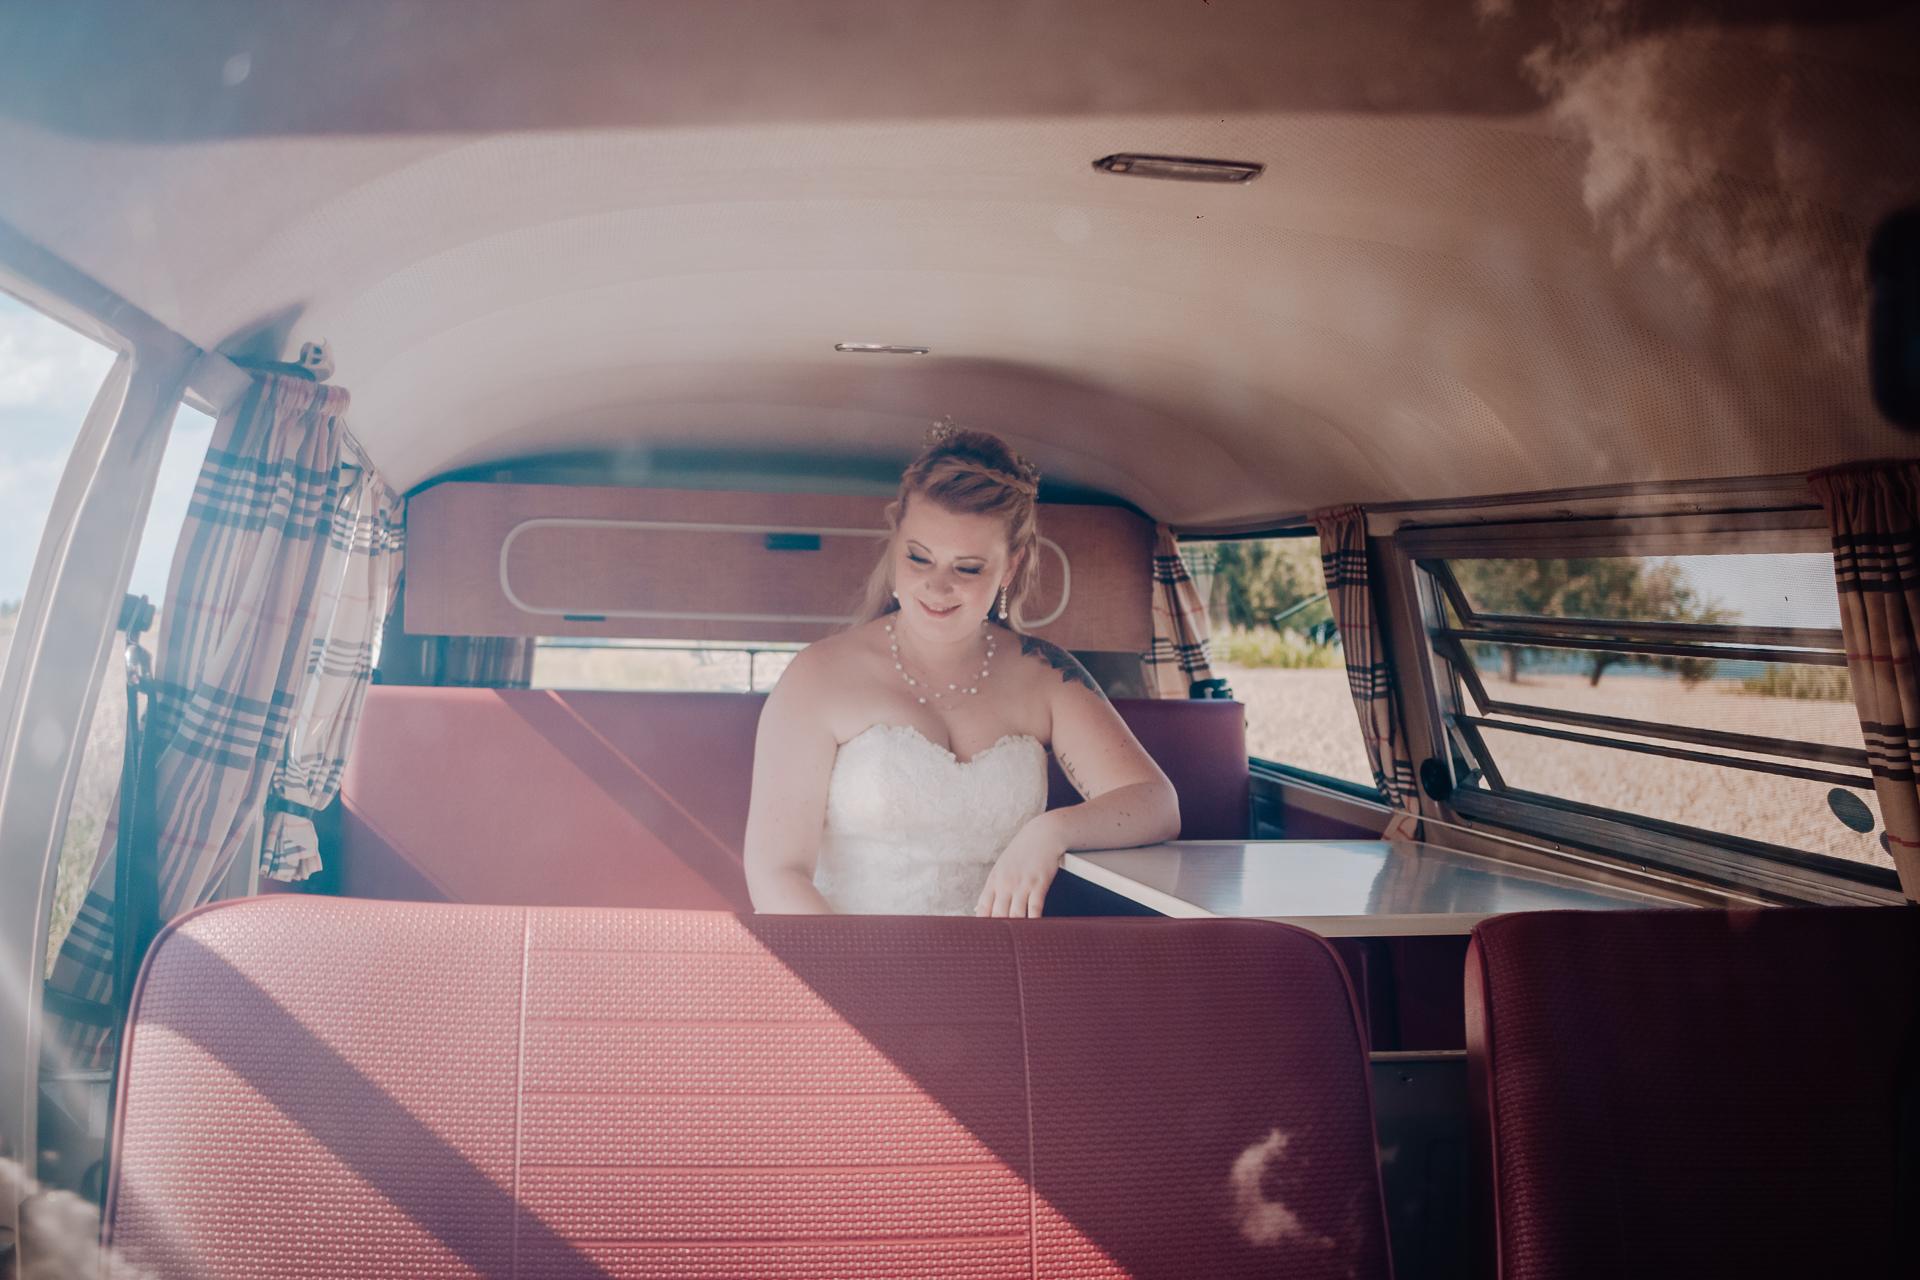 lisaundjonny_website_jasminjohanna_72dpi_100pz_1920-Lisa&Jonny — Coupleshooting1 –AdobeRGB — 200dpi — 070